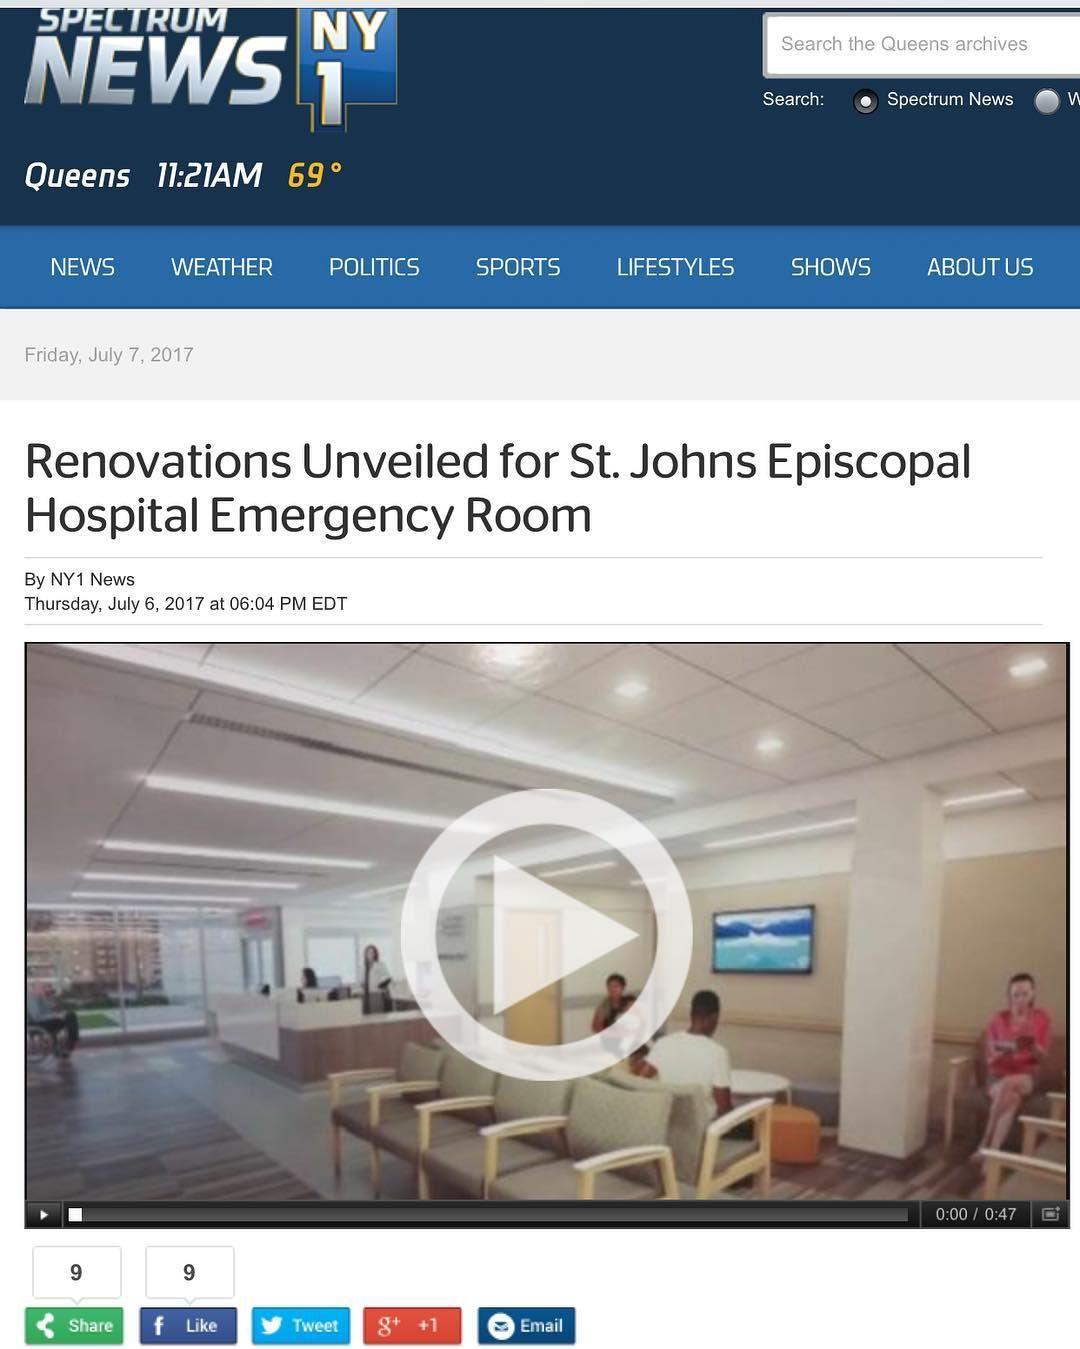 Pin by St. John's Episcopal Hospital on St. John's In the